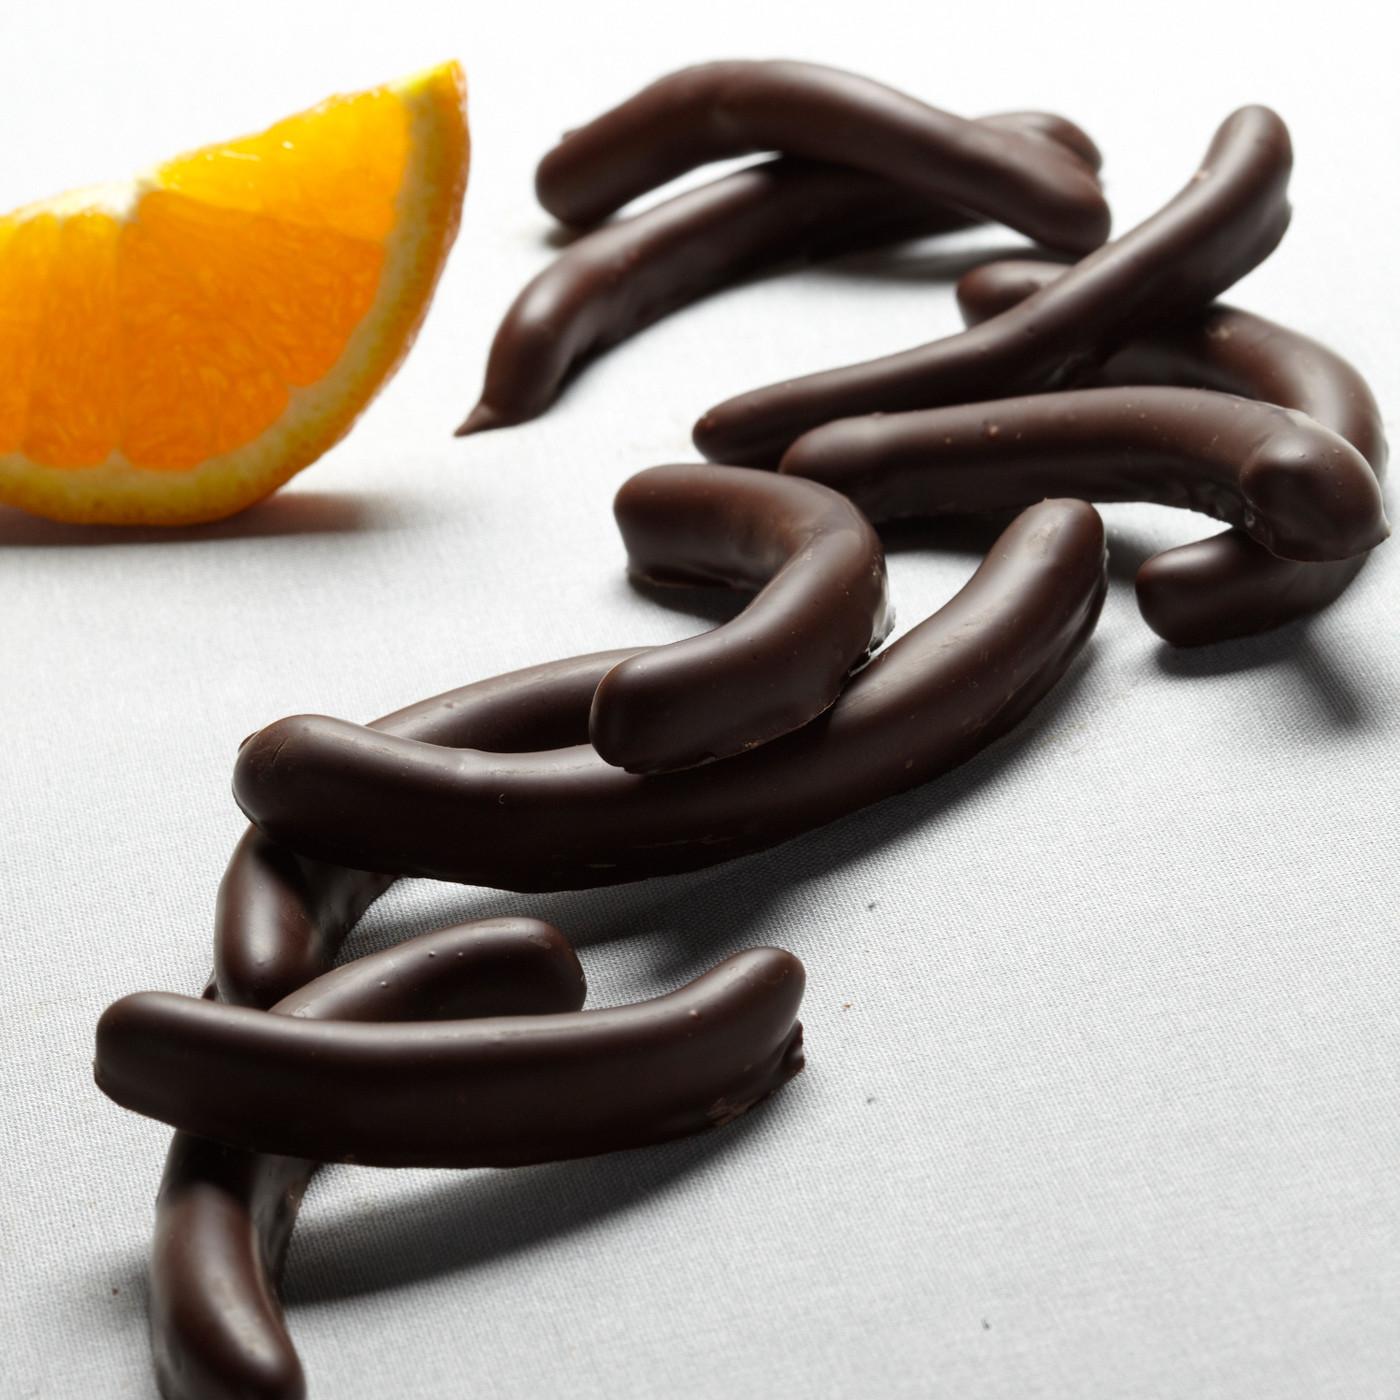 Orangette Gift, 8 oz.